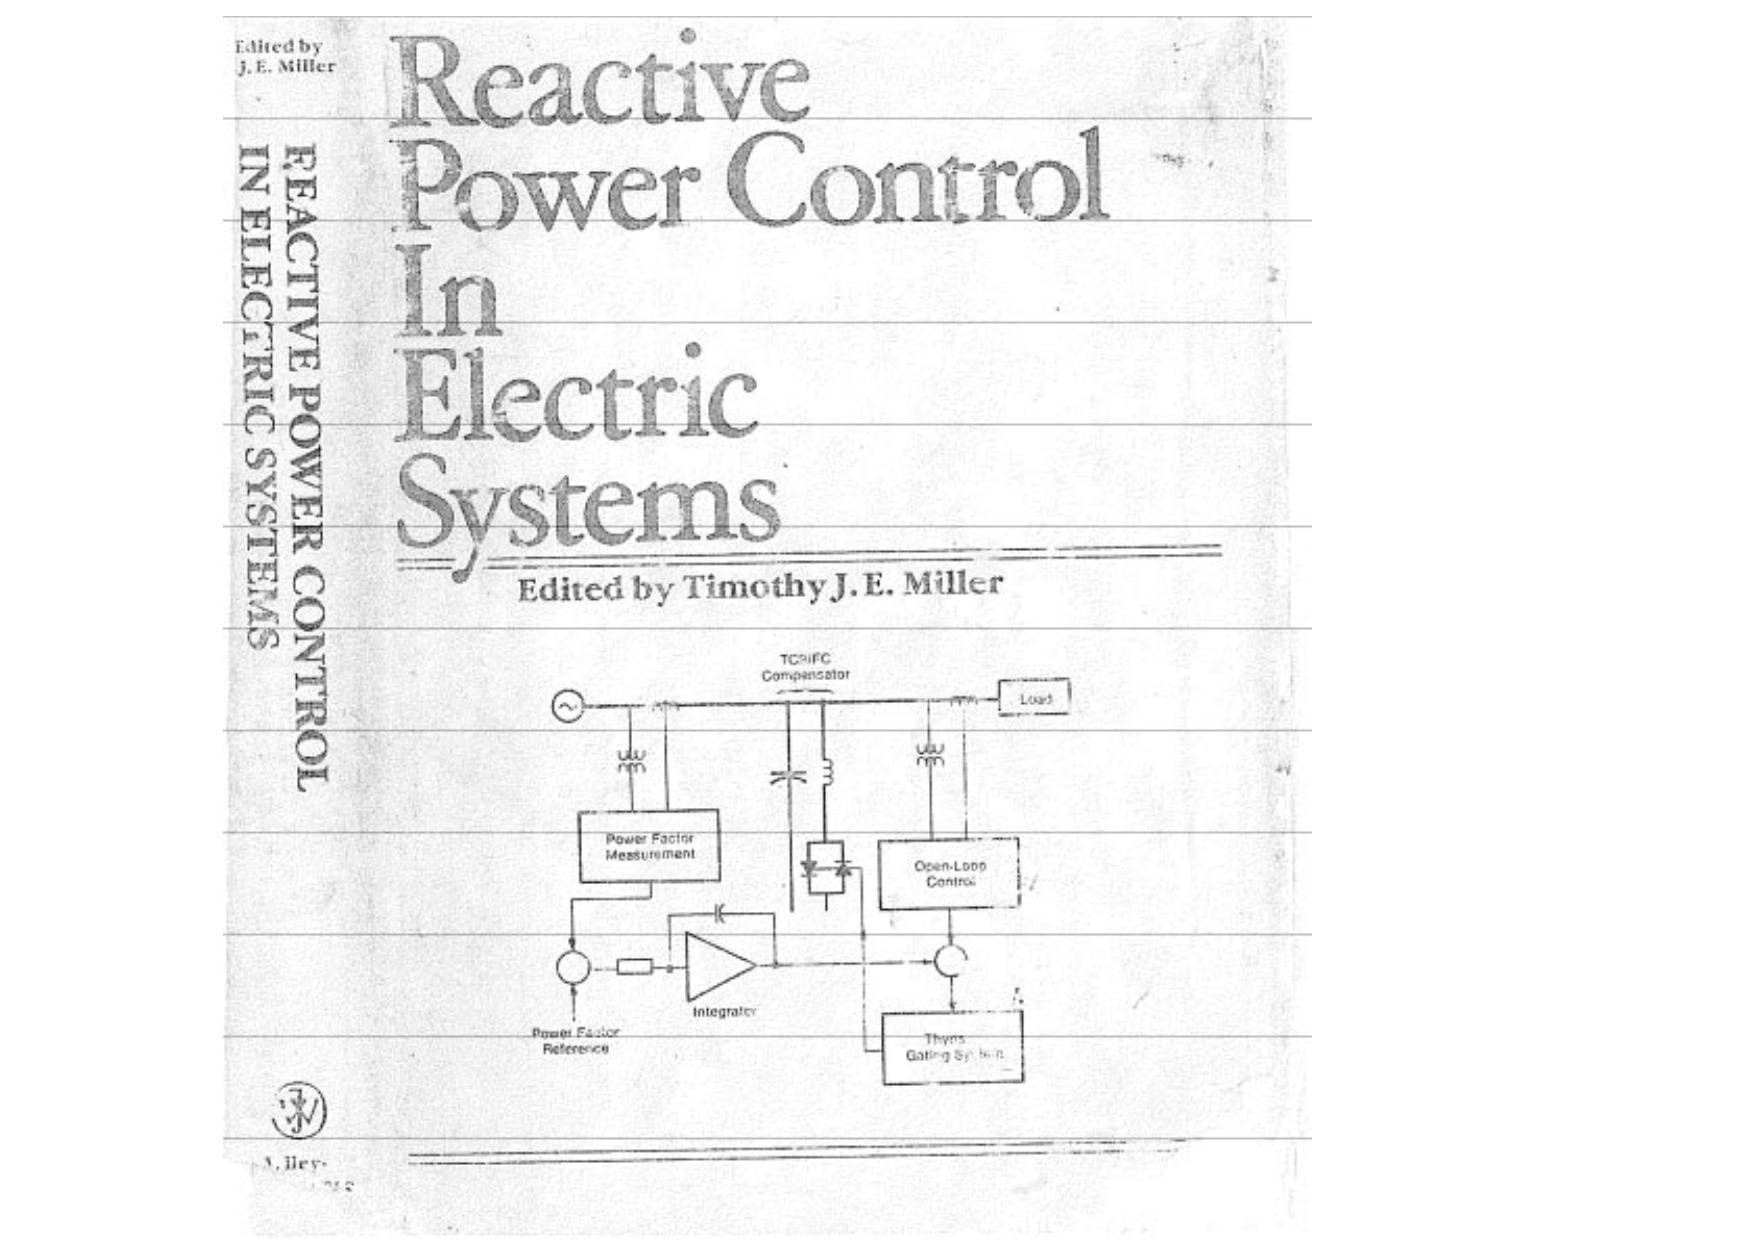 T J E Miller Reactive Power Control 1 1947 John Wiley Sons Inc